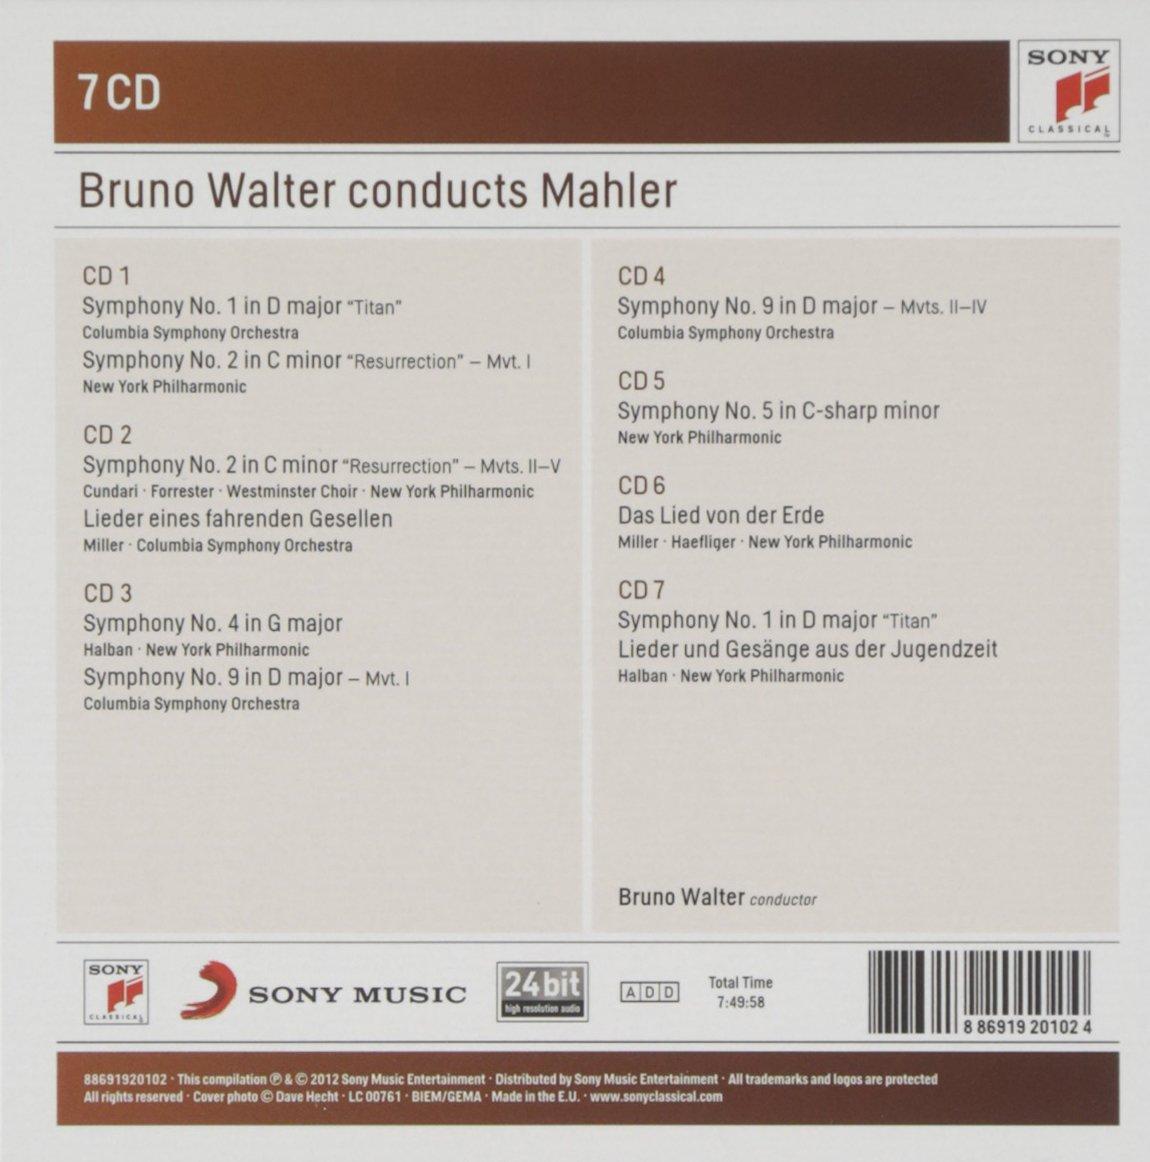 Bruno Walter conducts Mahler - Gustav Mahler, Bruno Walter: Amazon ...